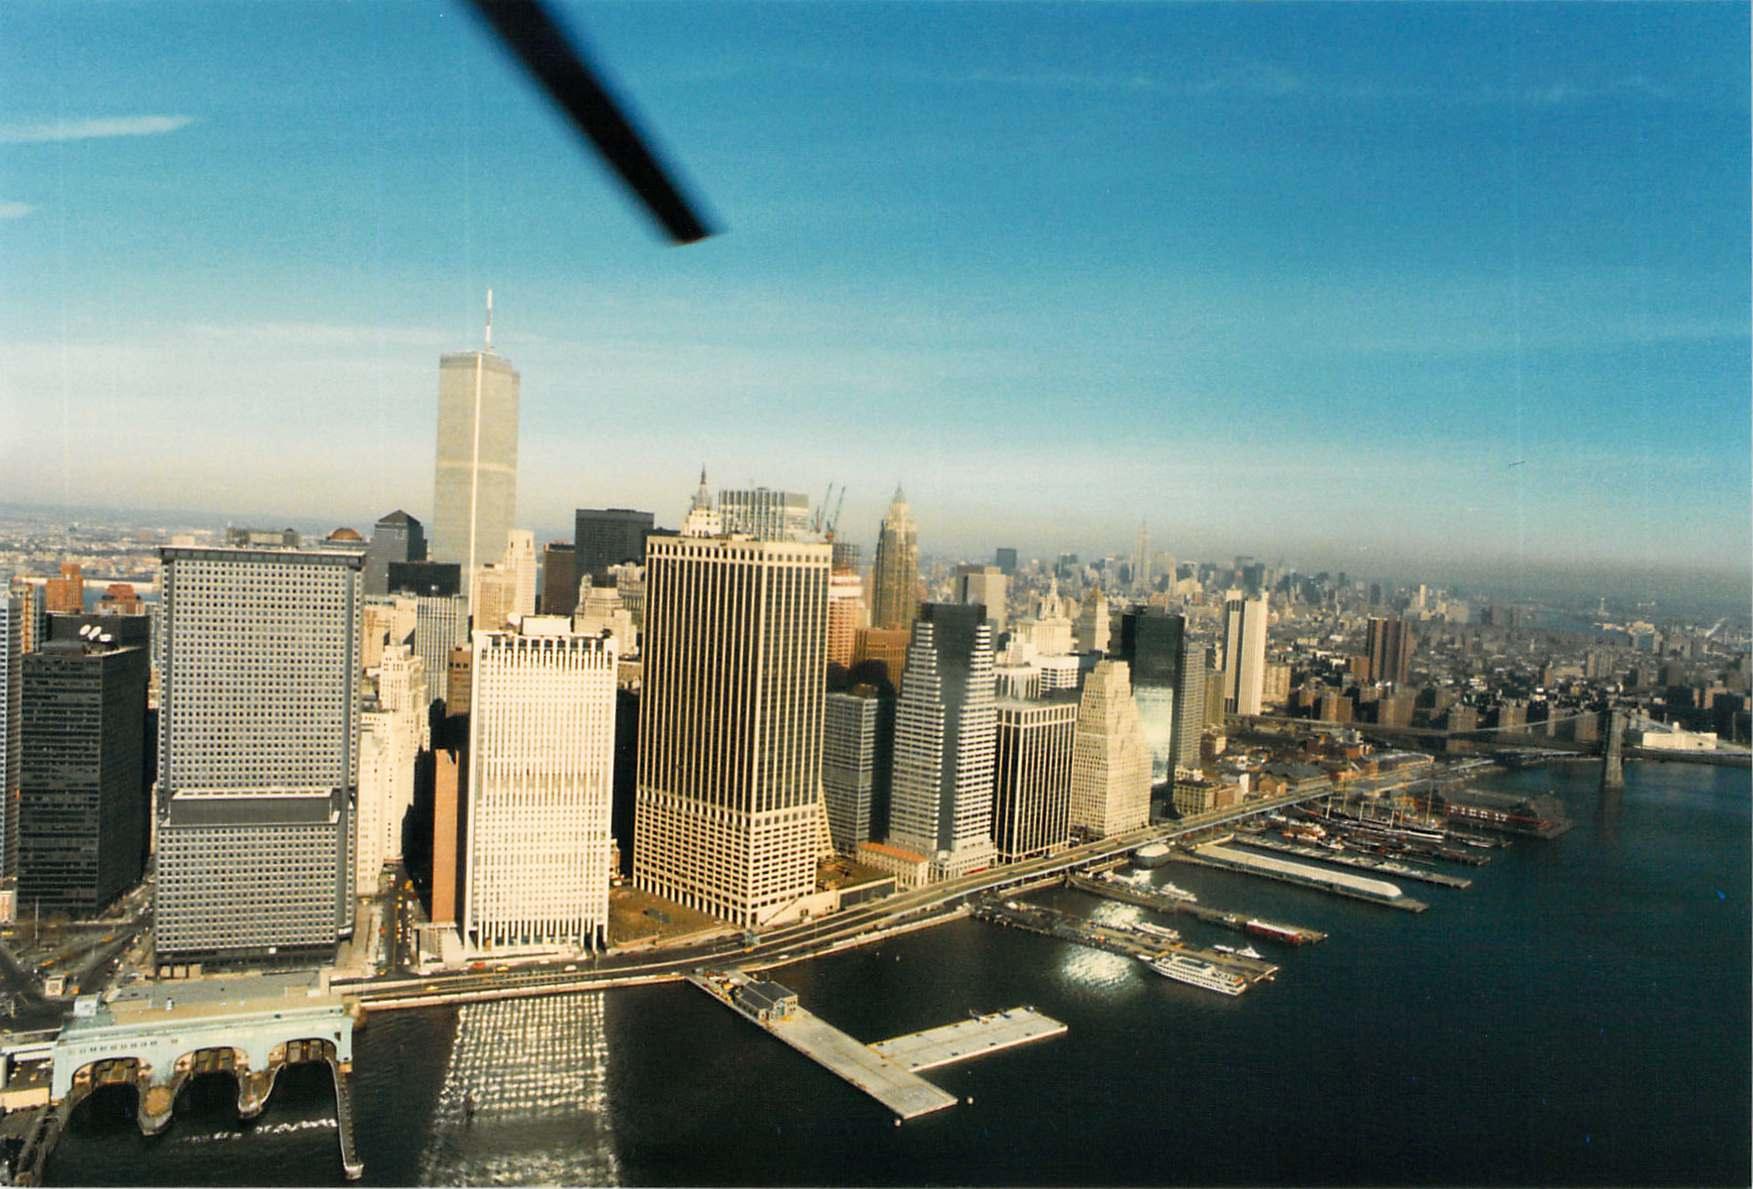 World Trade Center 6